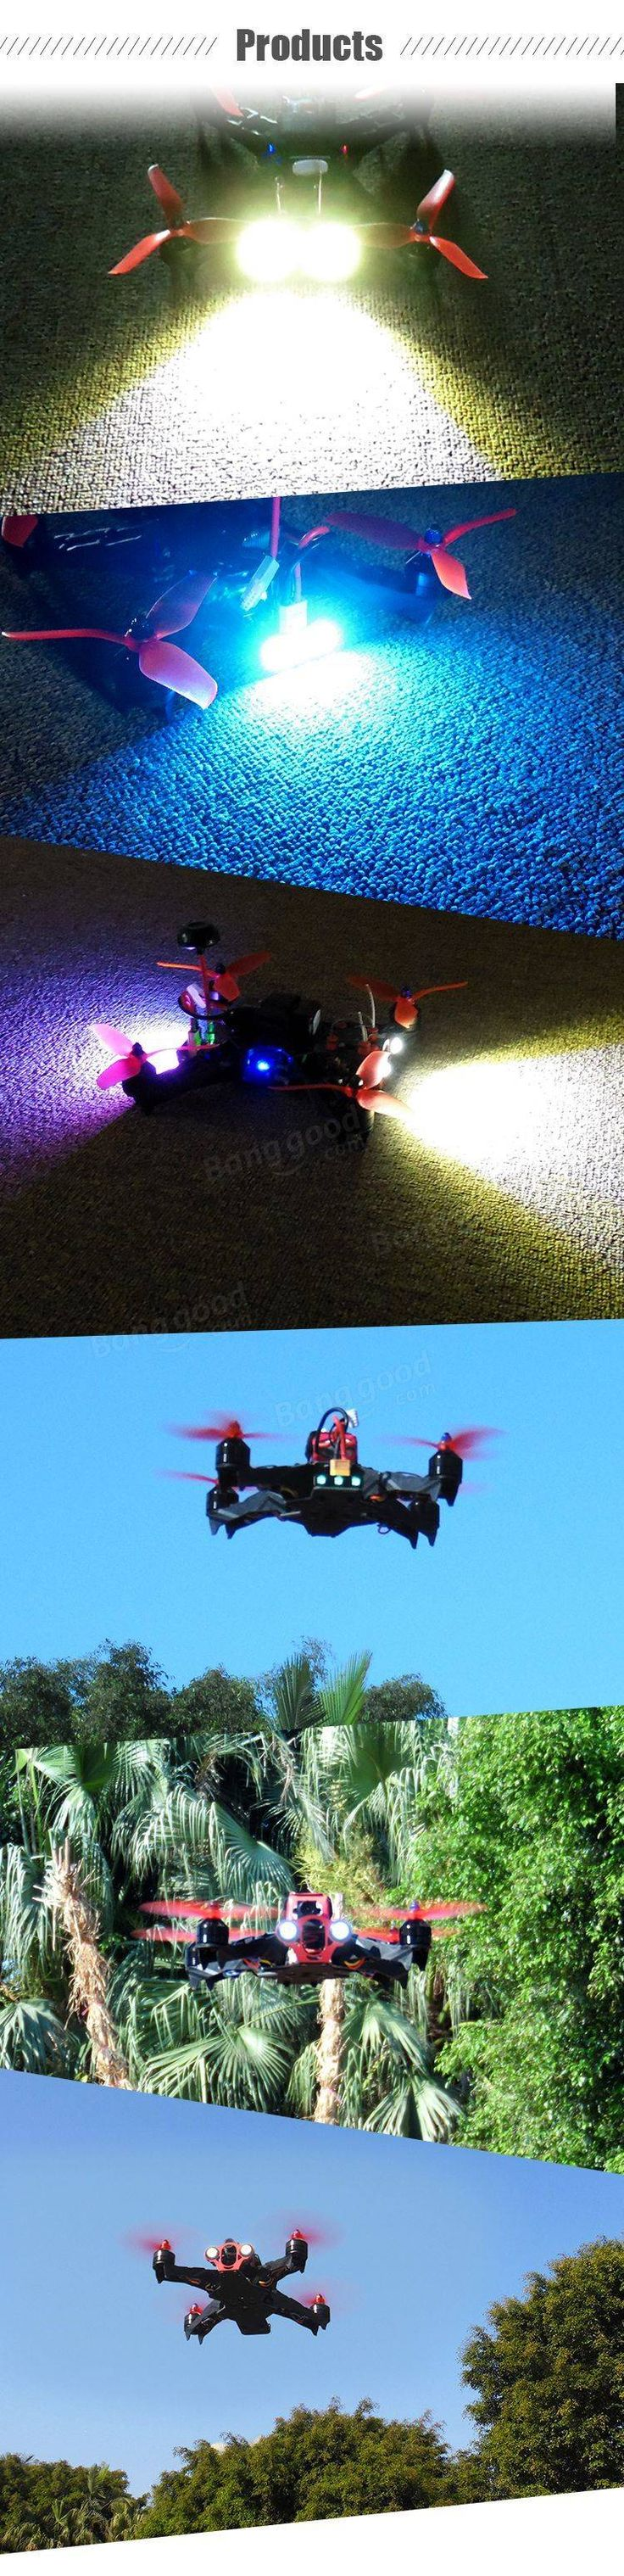 Eachine Racer 250 PRO FPV Drone Blheli_S 20A F3 5.8G 600mw 32CH VTX Built-in OSD 1000TVL Cam PNP